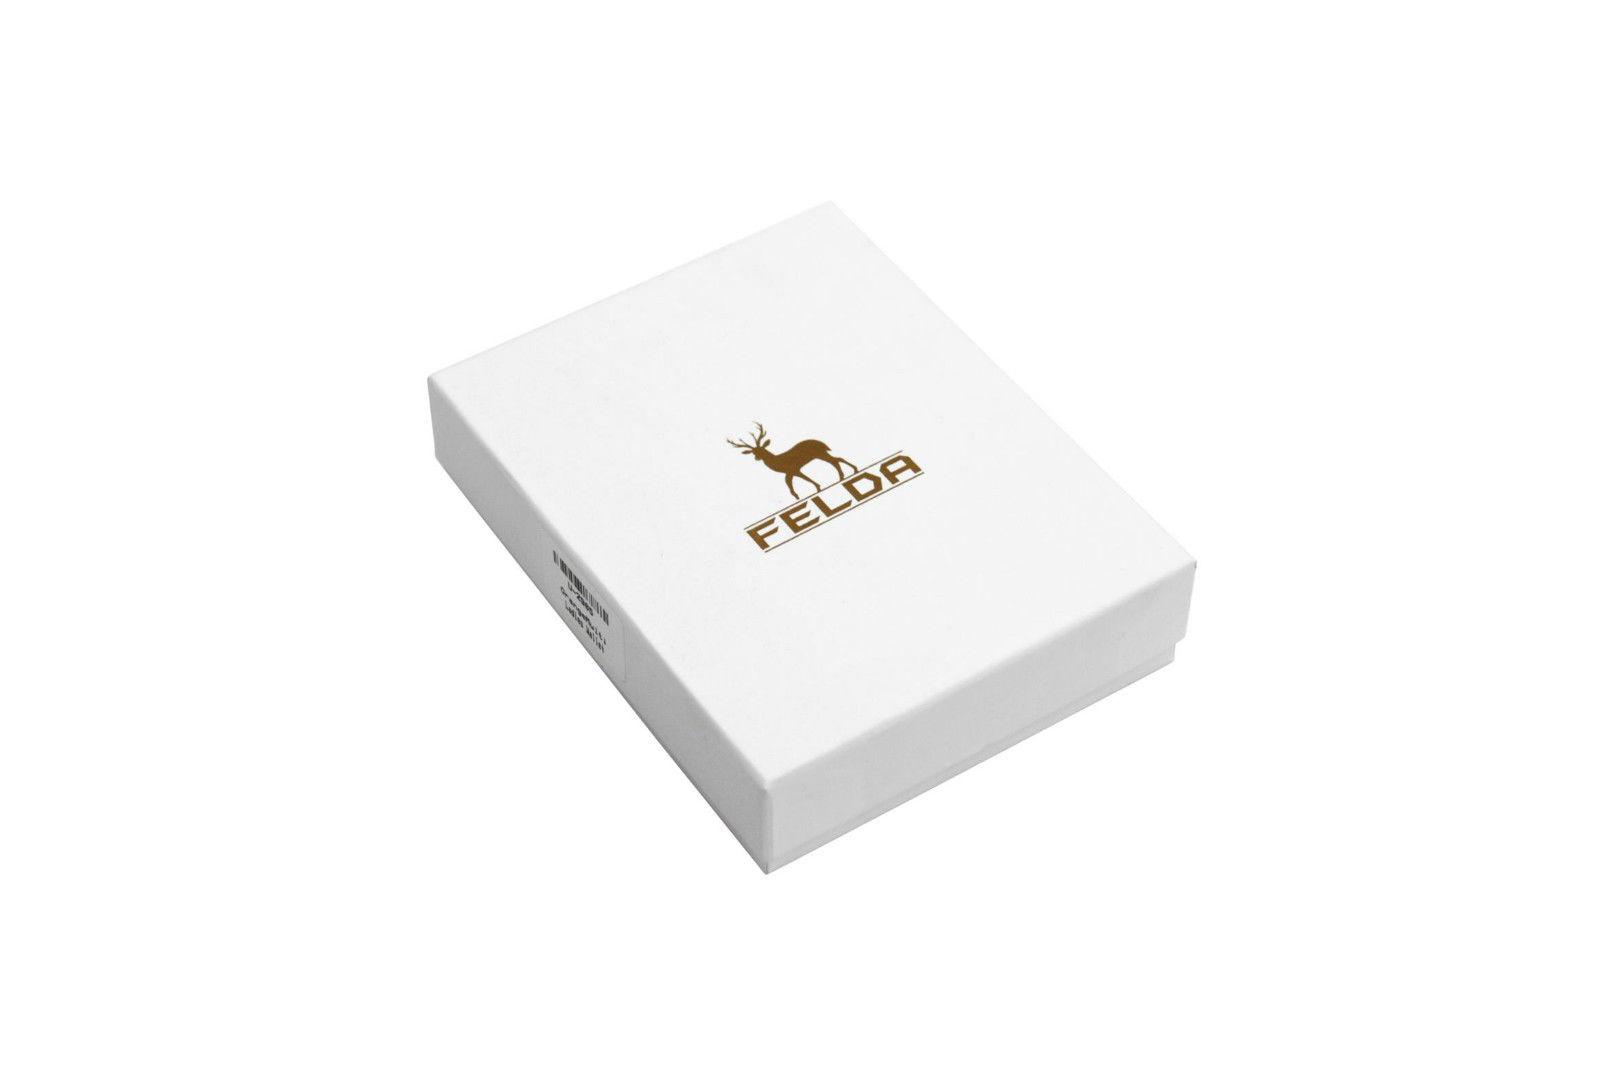 Felda-RFID-onorevoli-MEDAGLIA-amp-Card-Purse-Wallet-Genuine-Leather-Multi-SOFT-BOX-REGALO miniatura 71